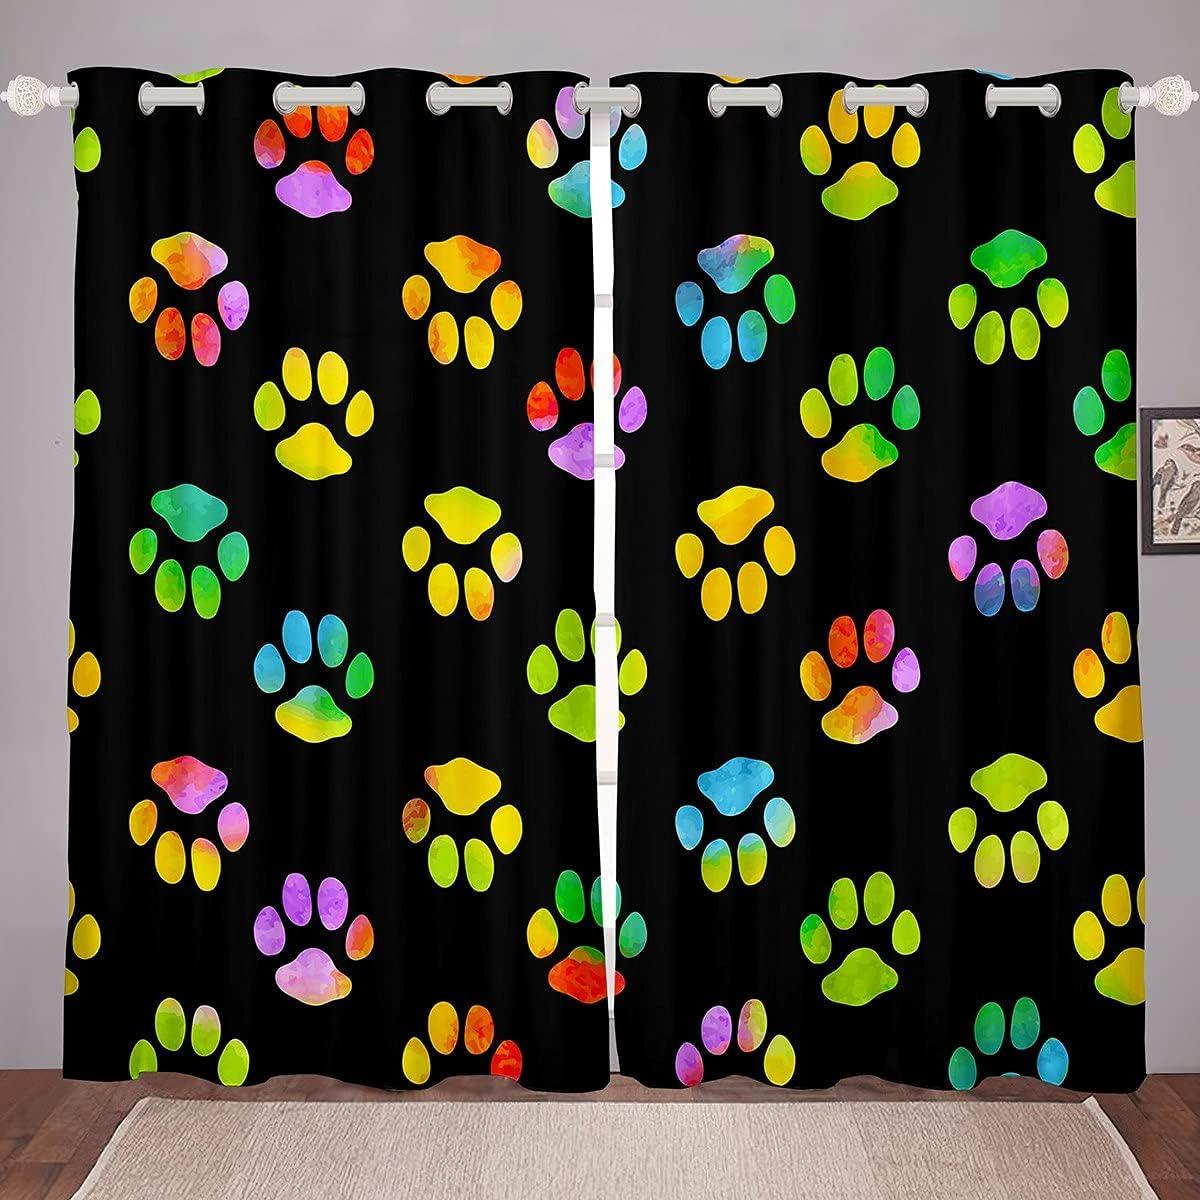 Paws Fashion Window Drapes Austin Mall Colorful Cat Dot Paw Treatment Kitchen